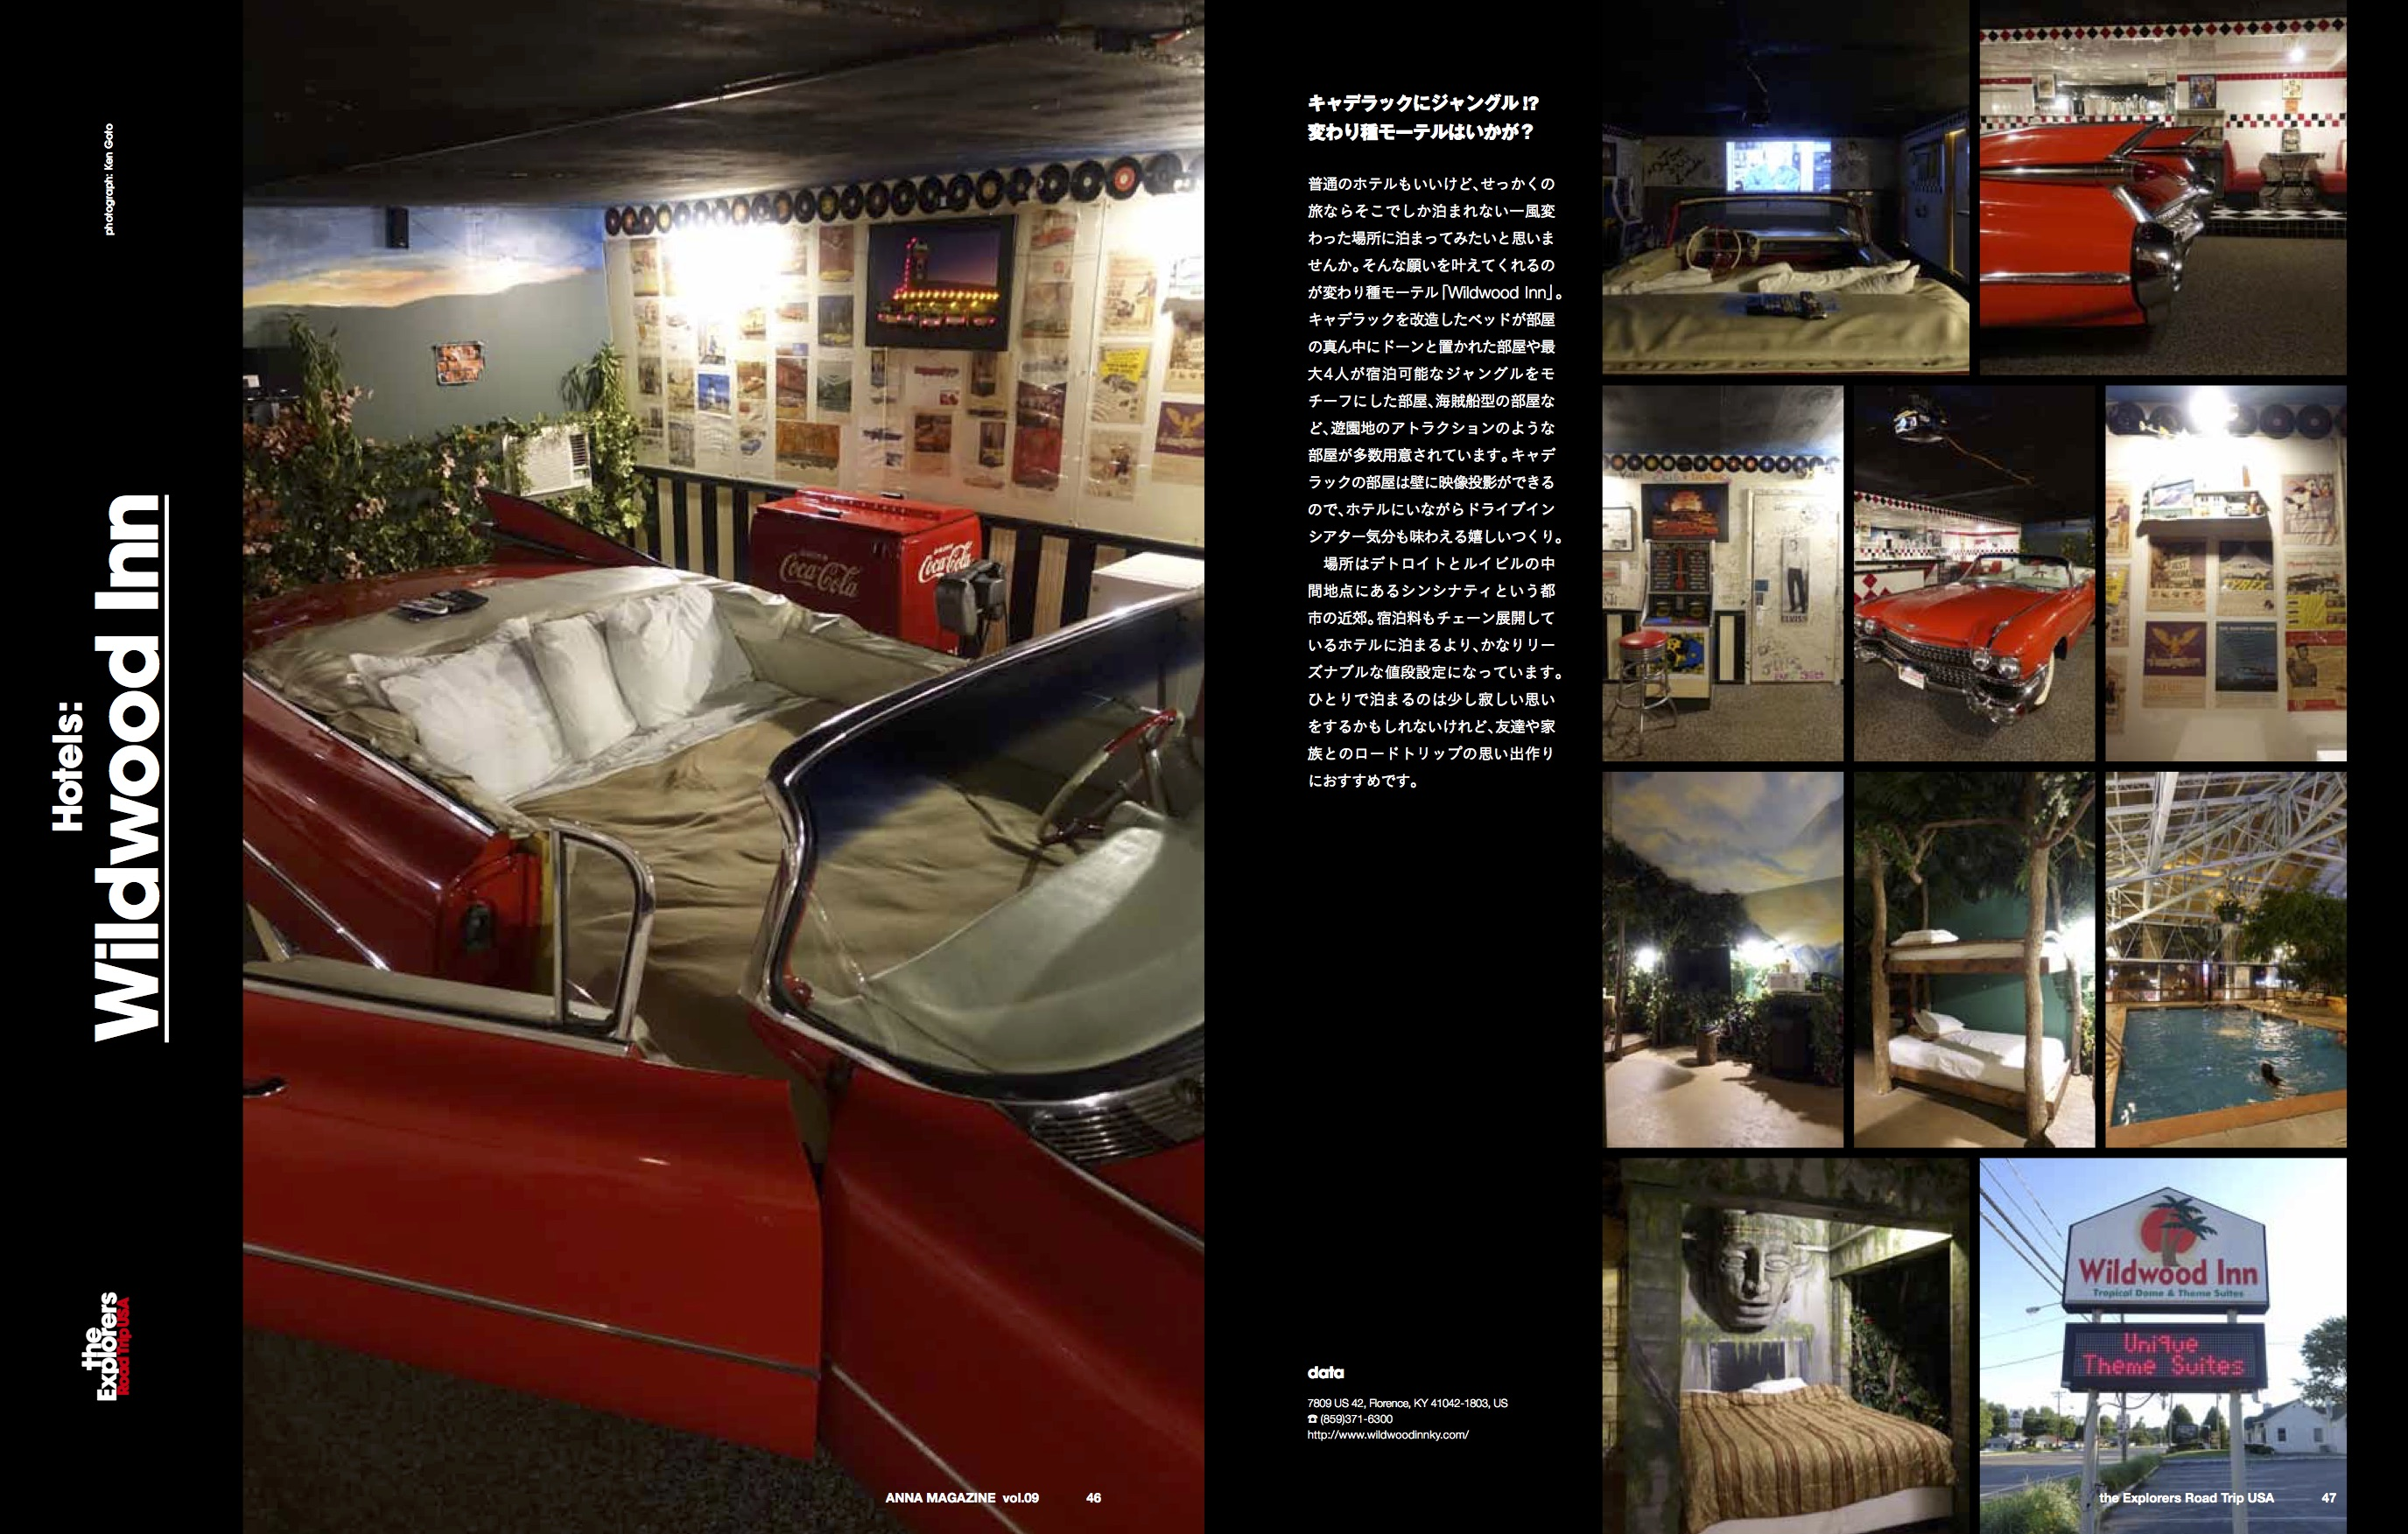 anna magazine vol.9 P23